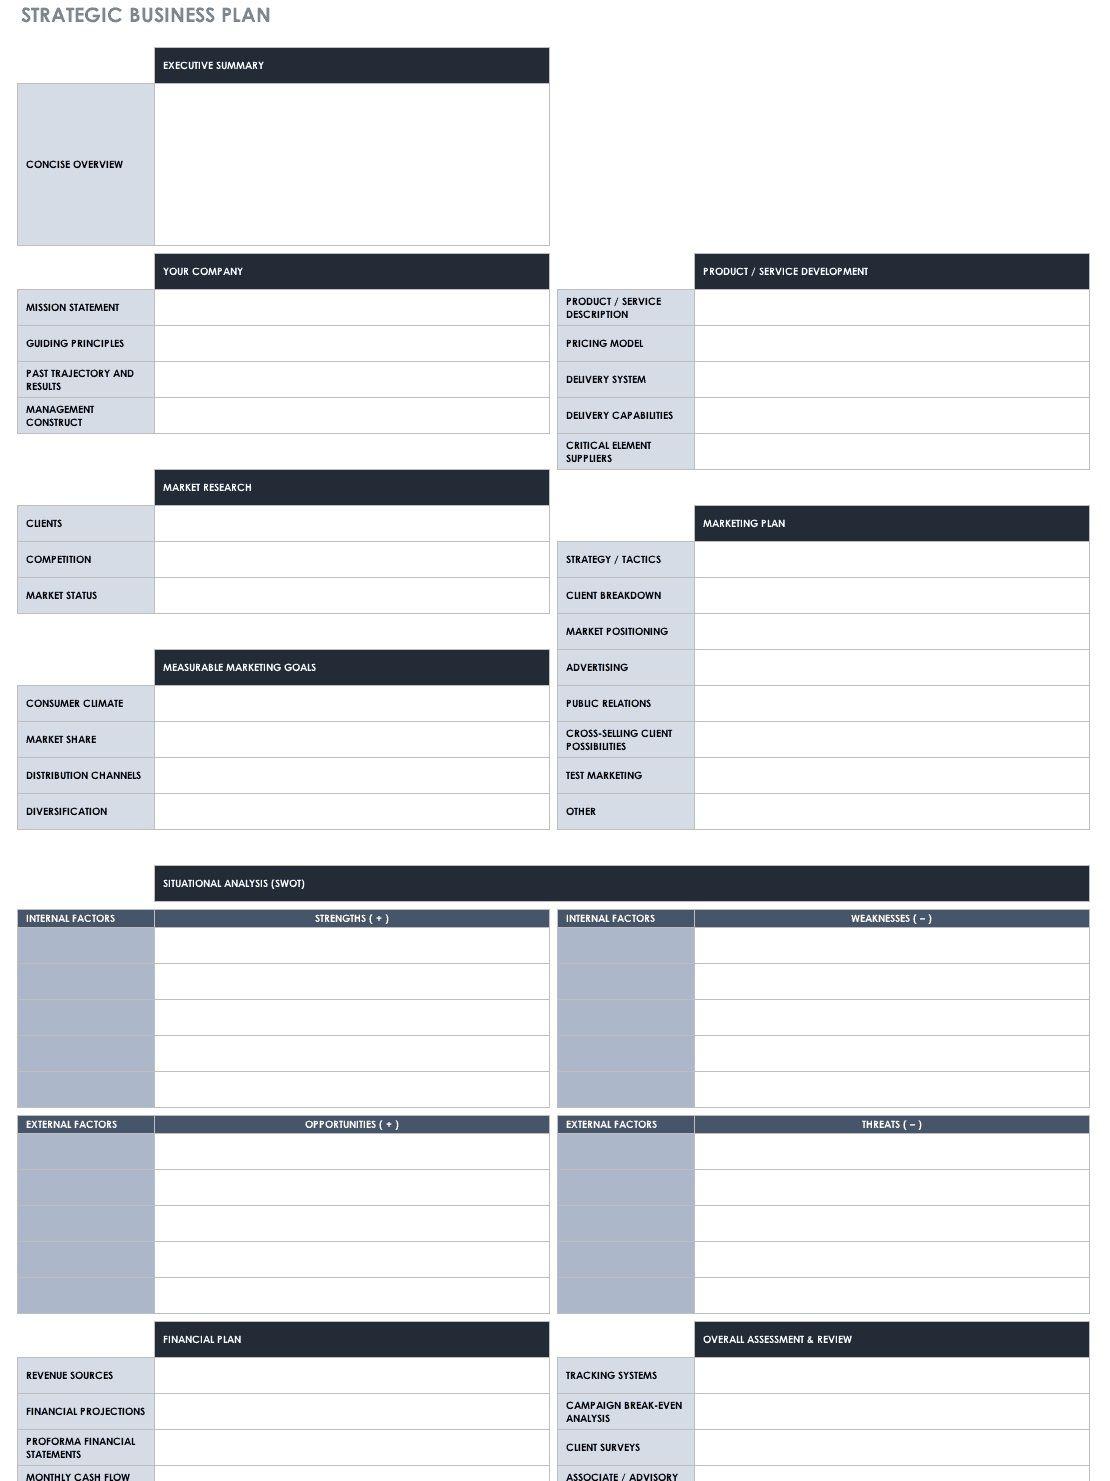 007 Impressive Strategic Busines Plan Template Highest Quality  Doc Word SampleFull